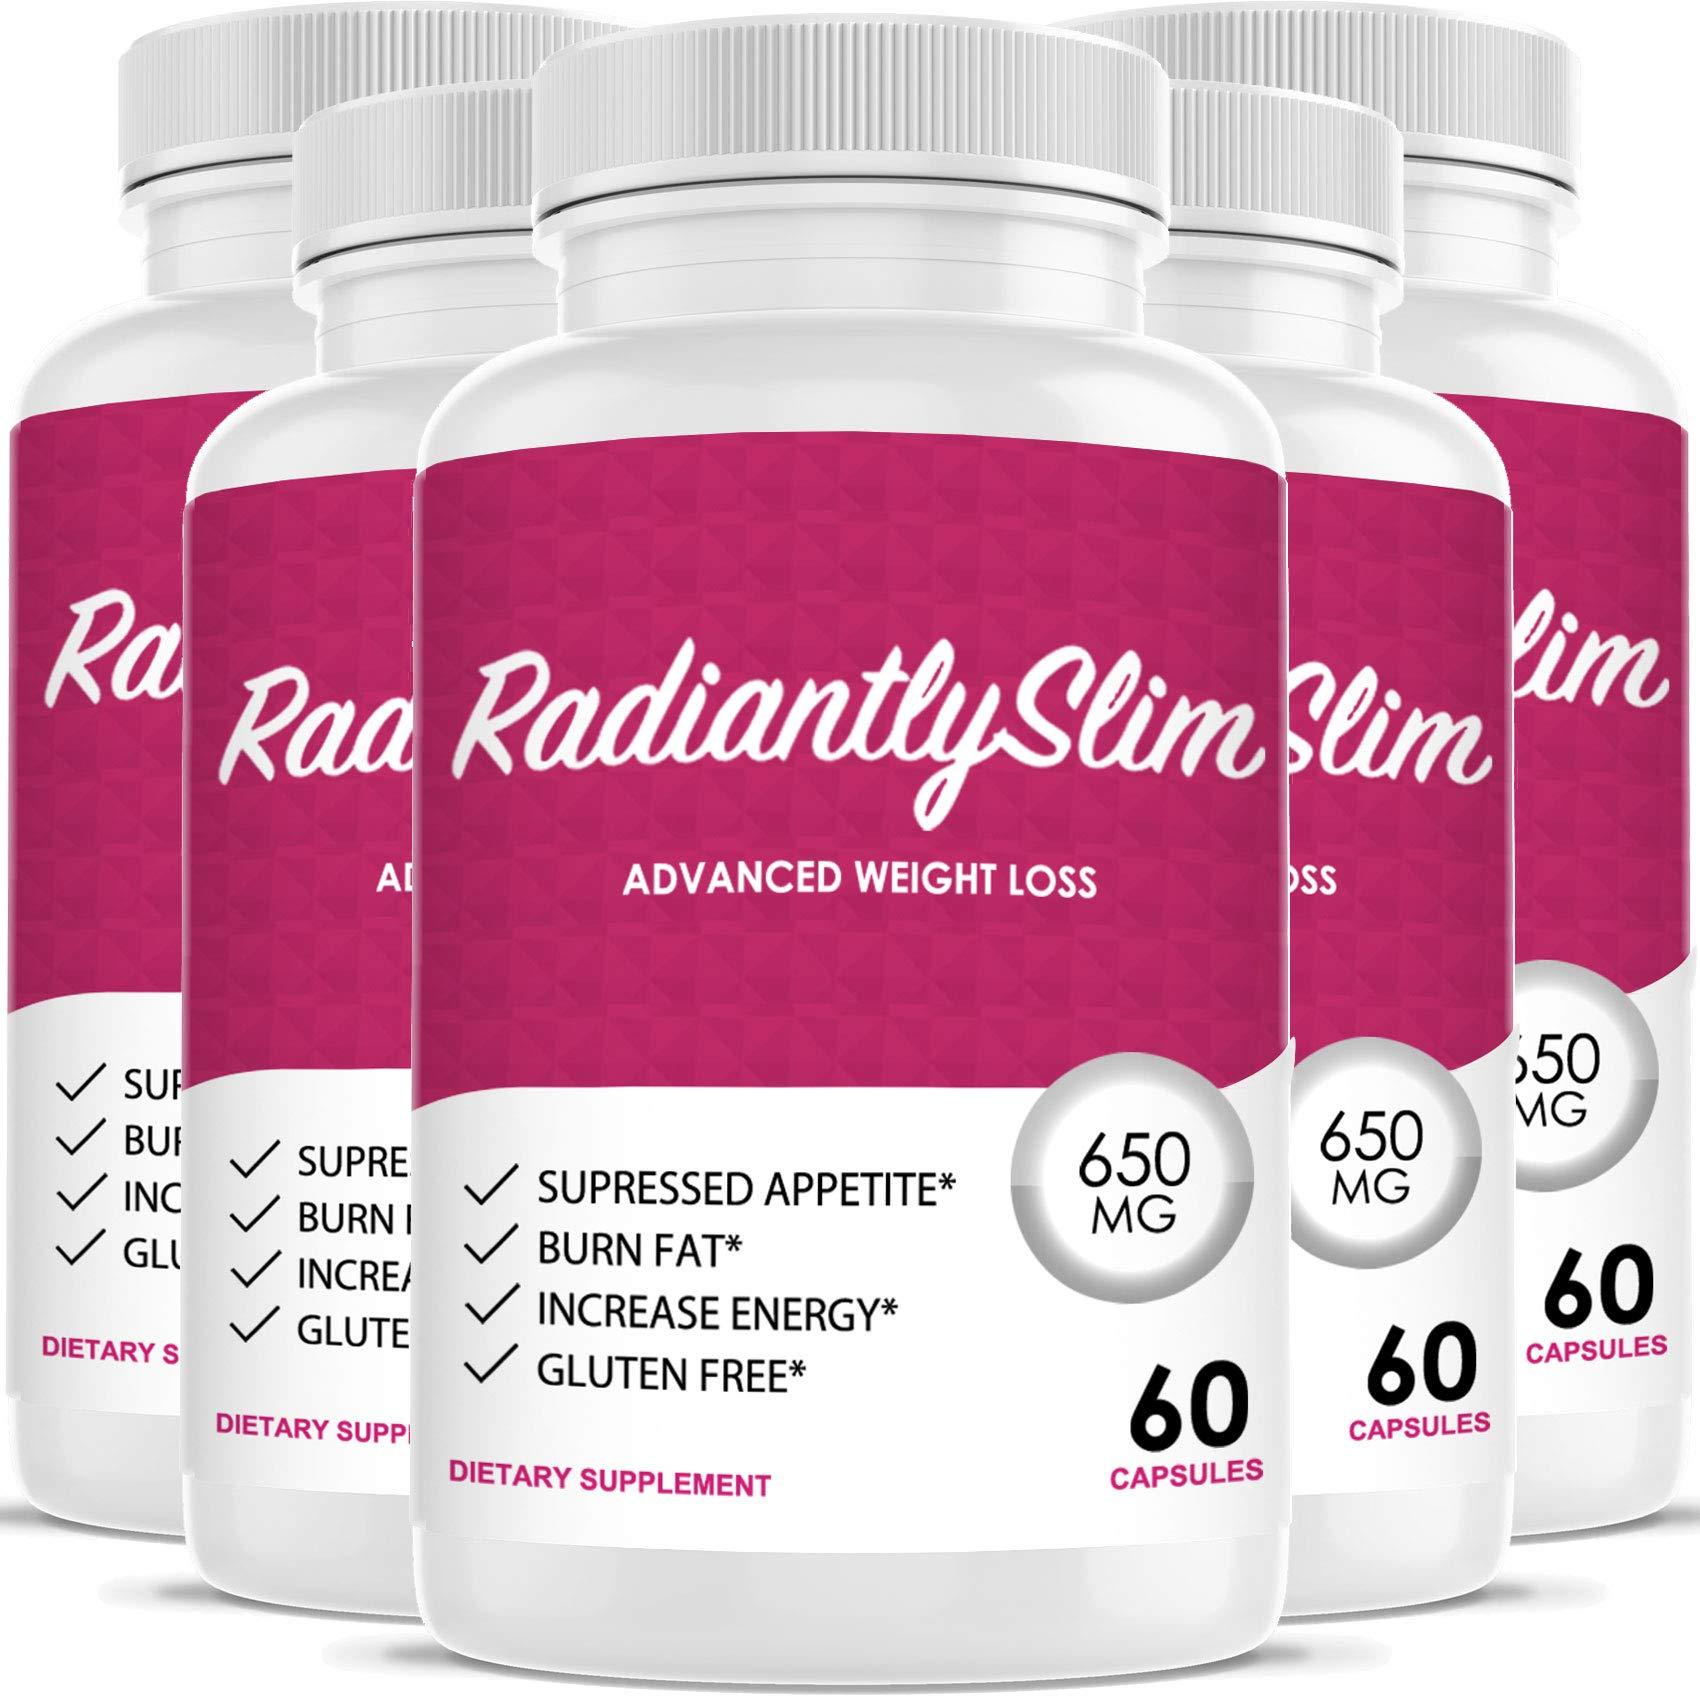 Radiantly Slim Pills for WeightLoss - Advanced Weigh Loss Supplement - Quicker Fat Burn - Carb Blocker (5 Month Supply)